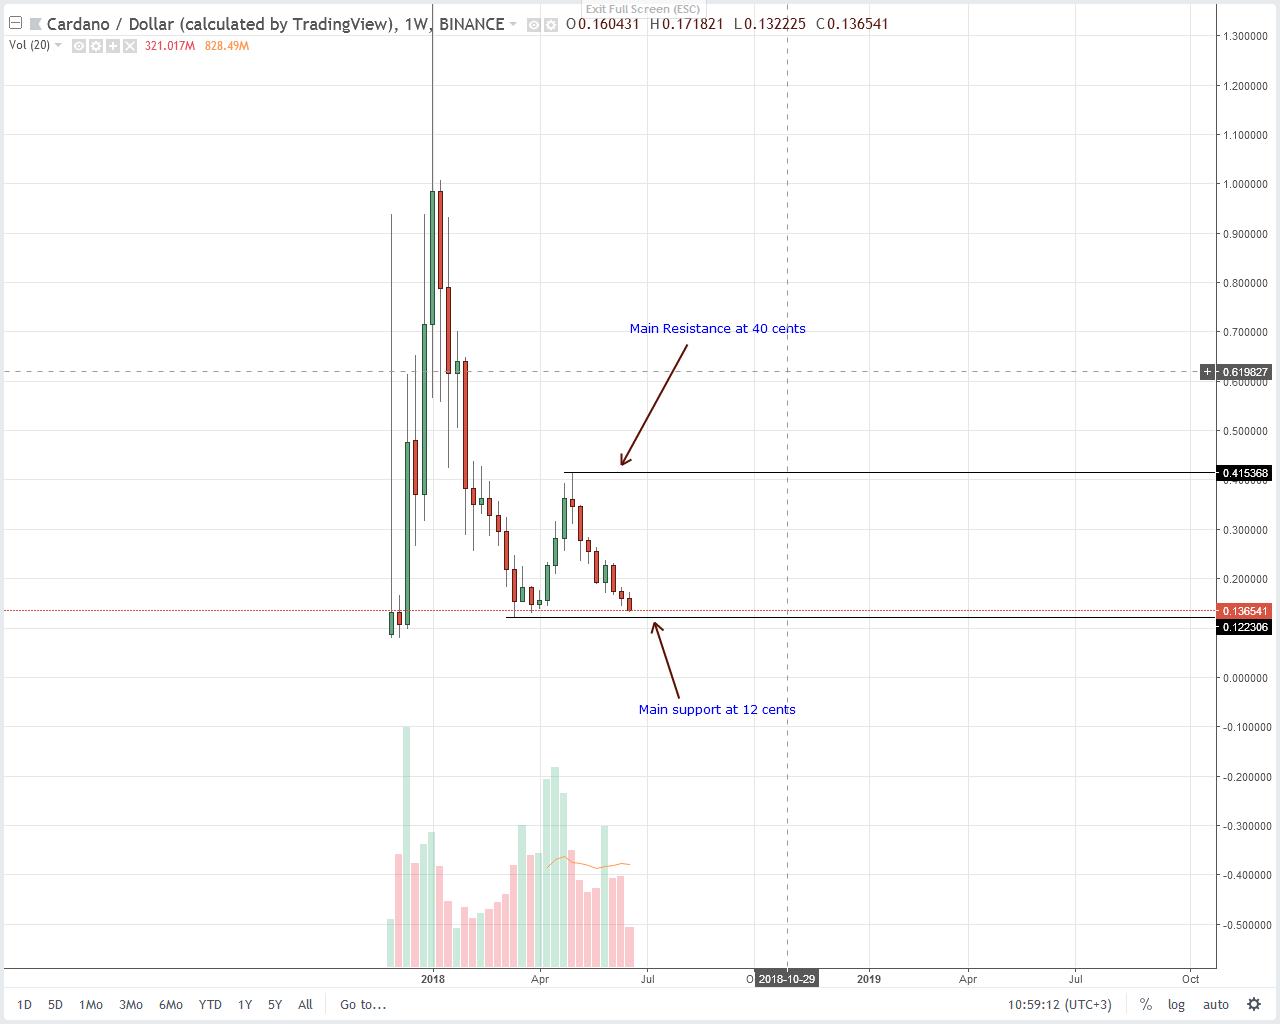 Cardano (ADA) Technical Analysis